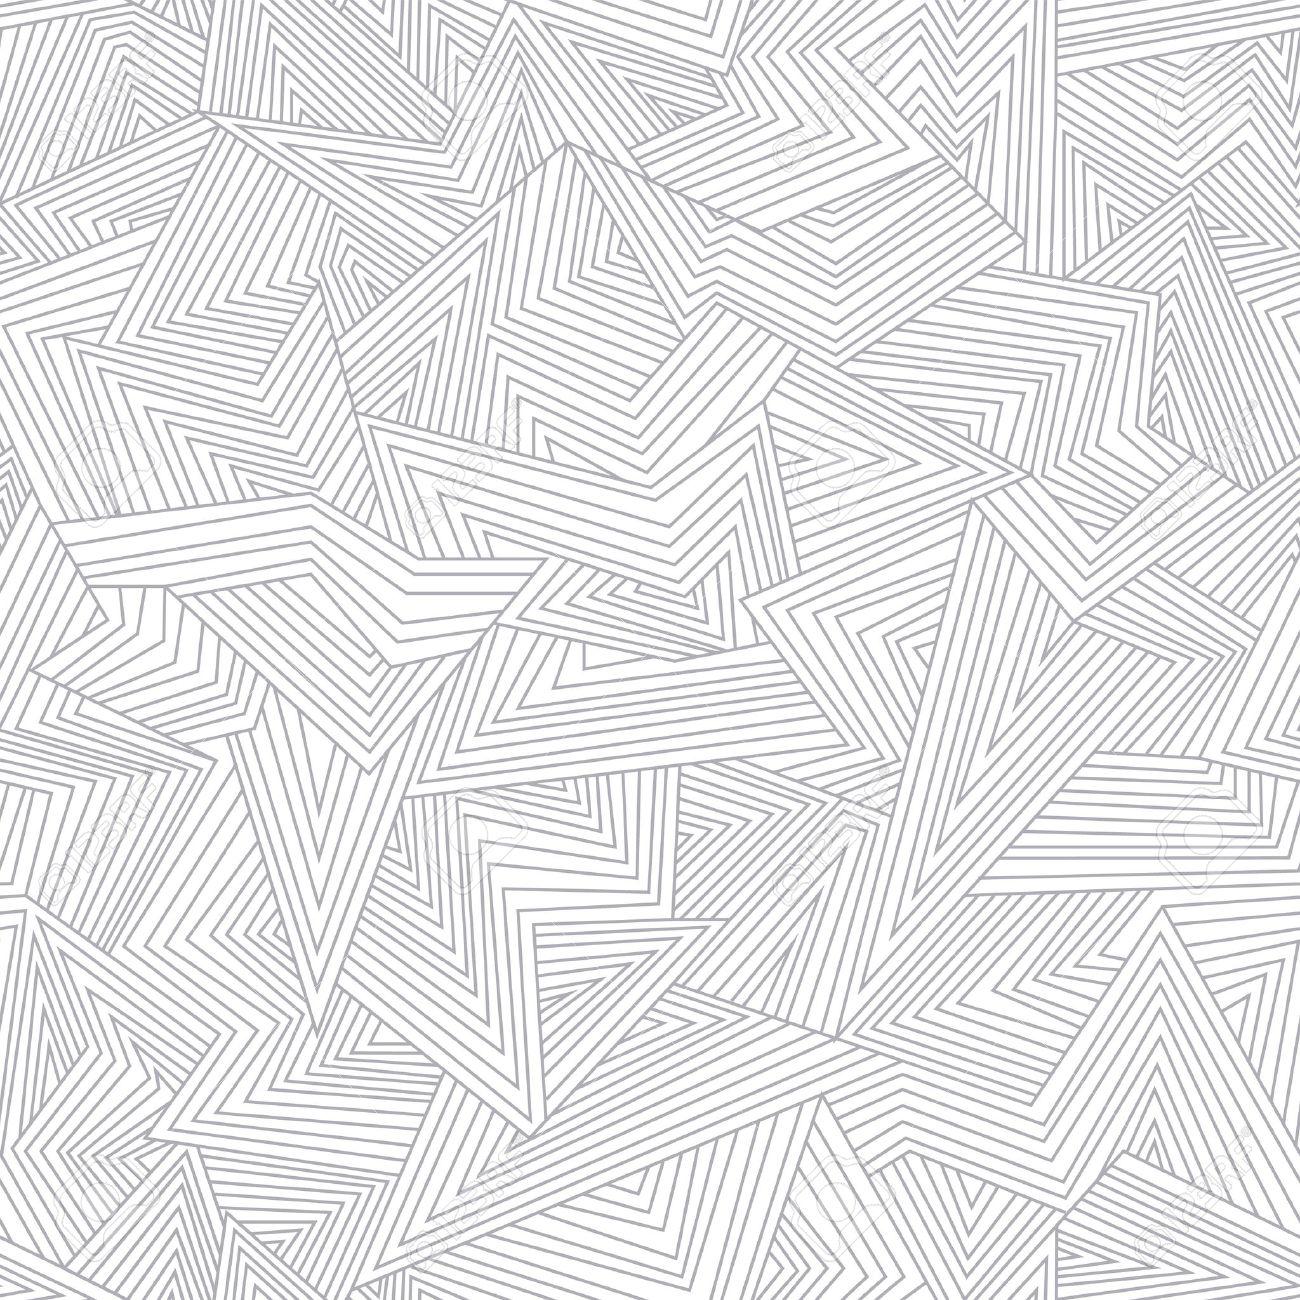 Seamless abstract pattern. Broken lines. Stock Vector - 15135047